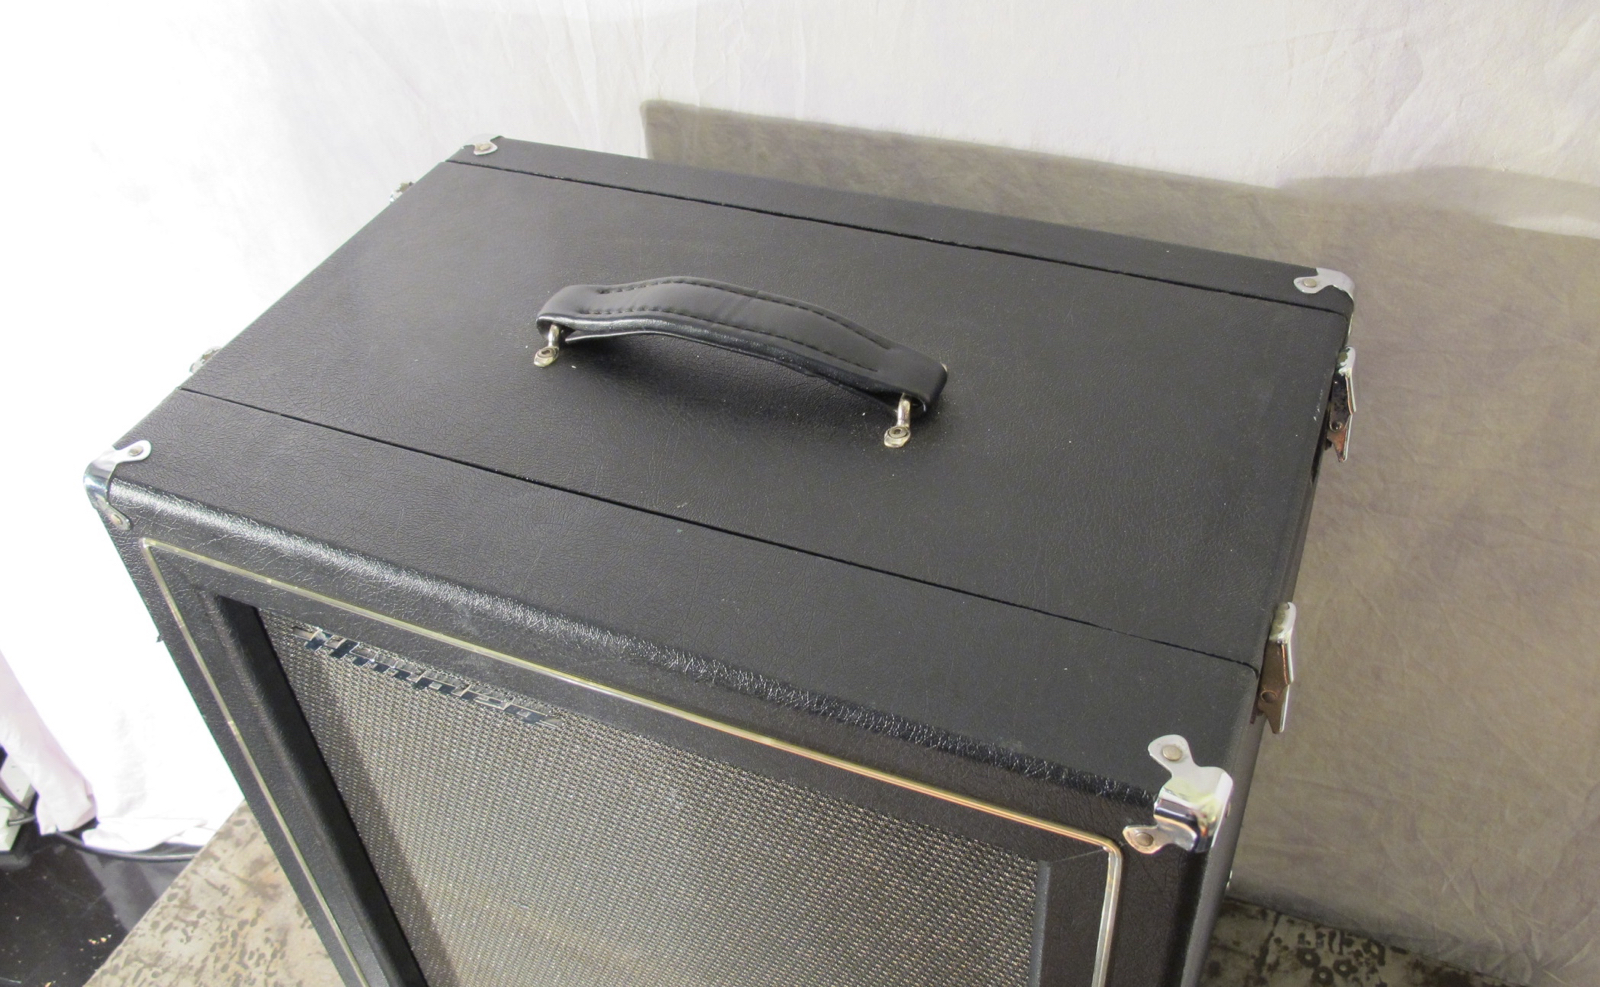 Ampeg B15NF 1967 Black Tolex Amp For Sale Andy Baxter Bass & Guitars Ltd